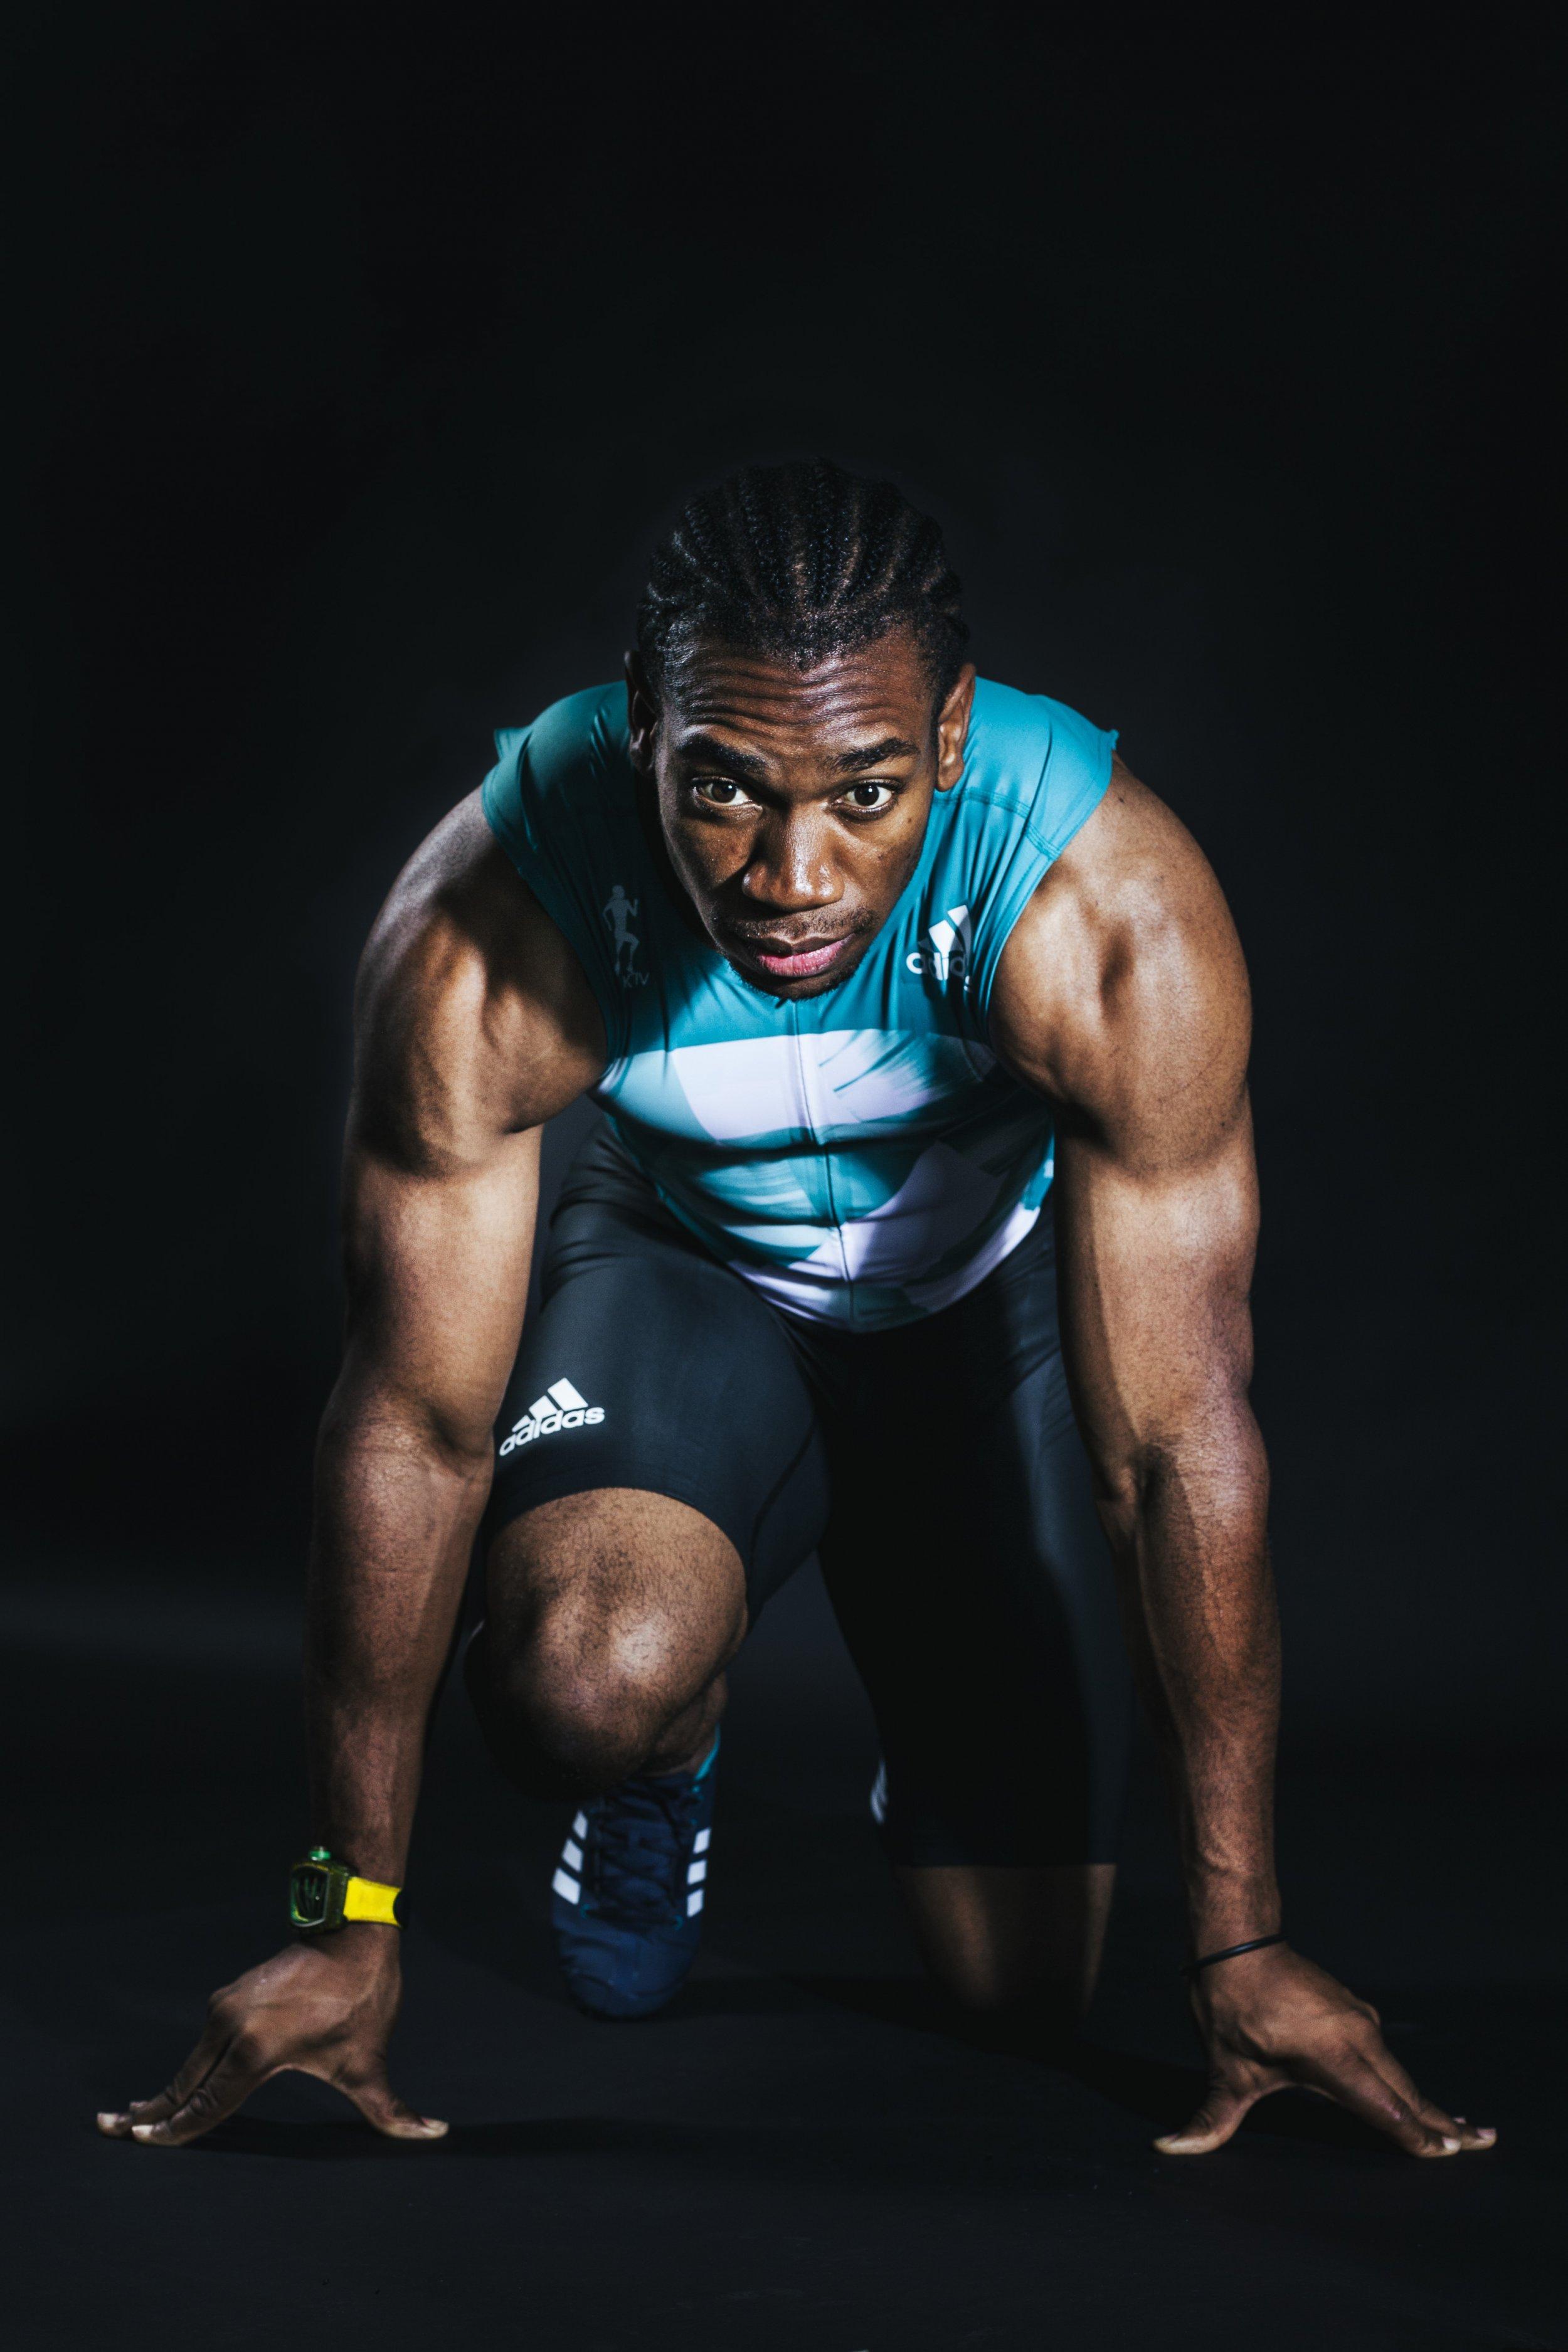 Yohan Blake, sprinter